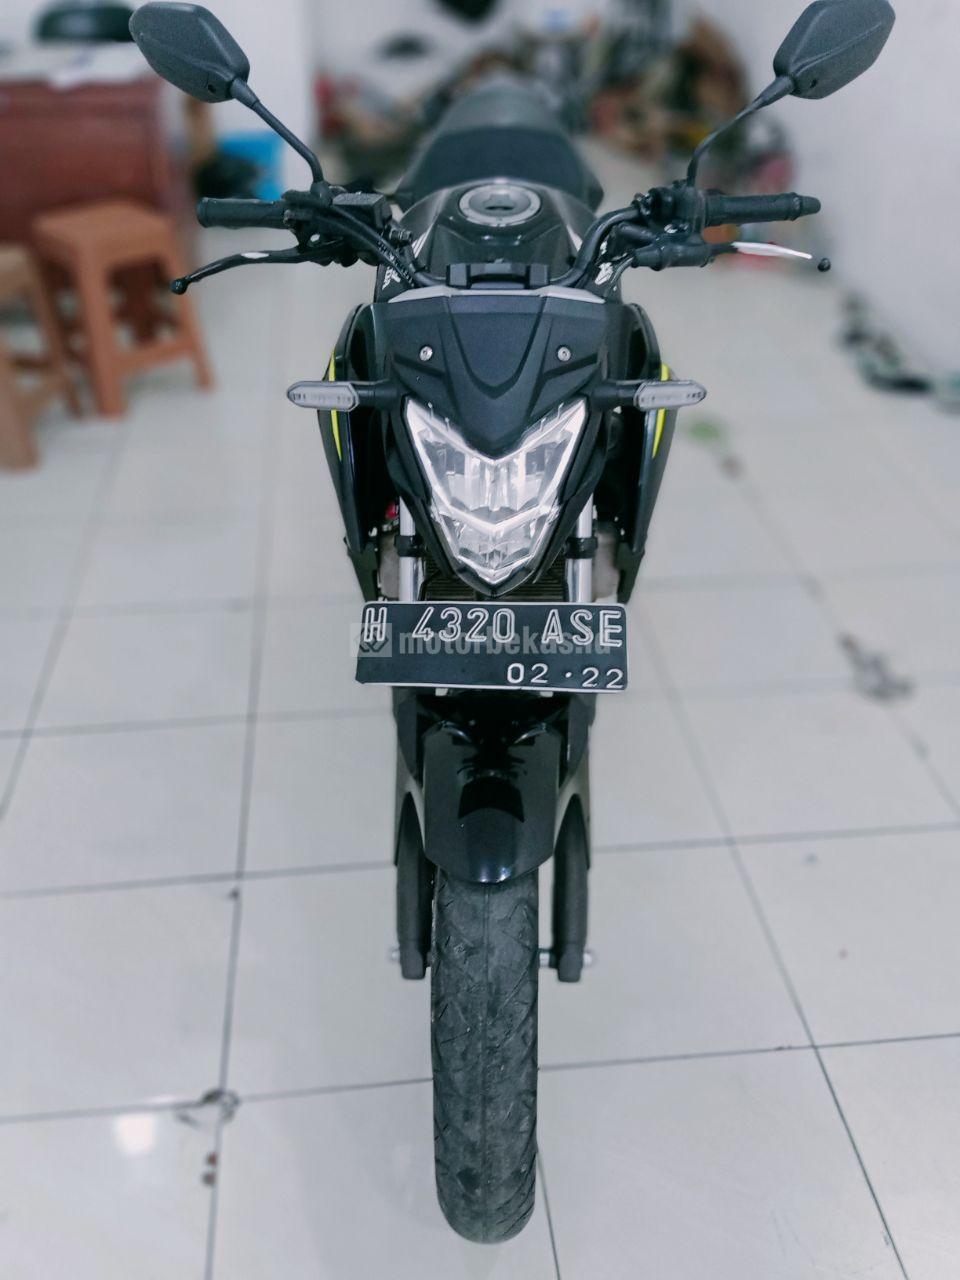 HONDA CB150R 2017 FI 2395 motorbekas.id